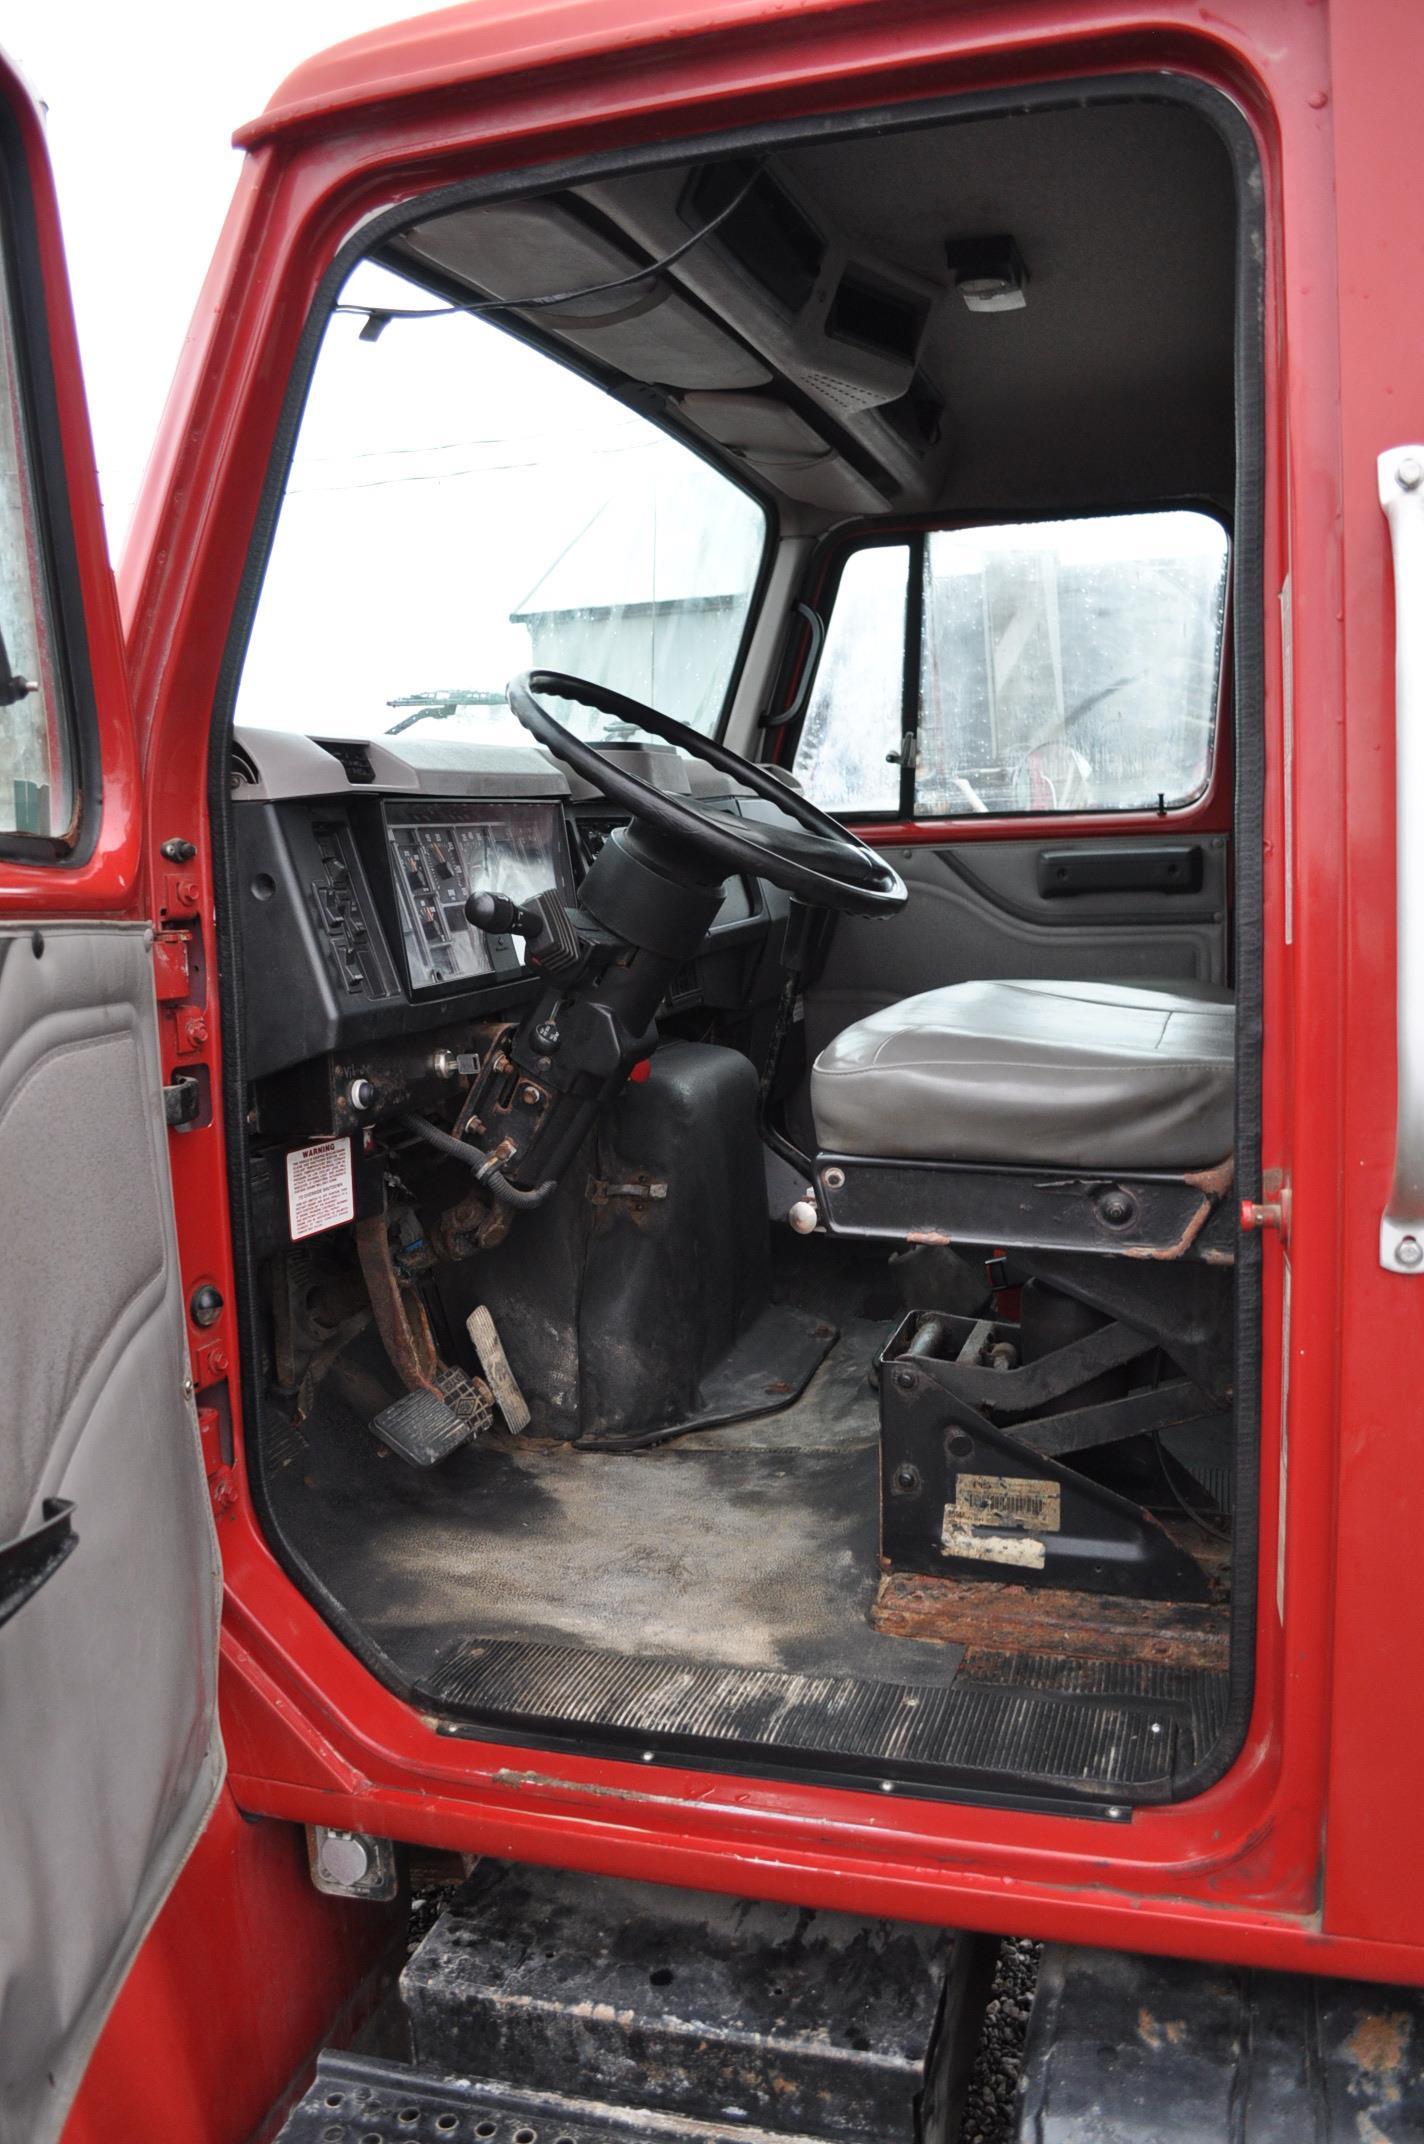 2000 International 4900 dry fertilizer tender truck, single axle, DT466E, Spicer 6 spd, spring ride, - Image 18 of 21